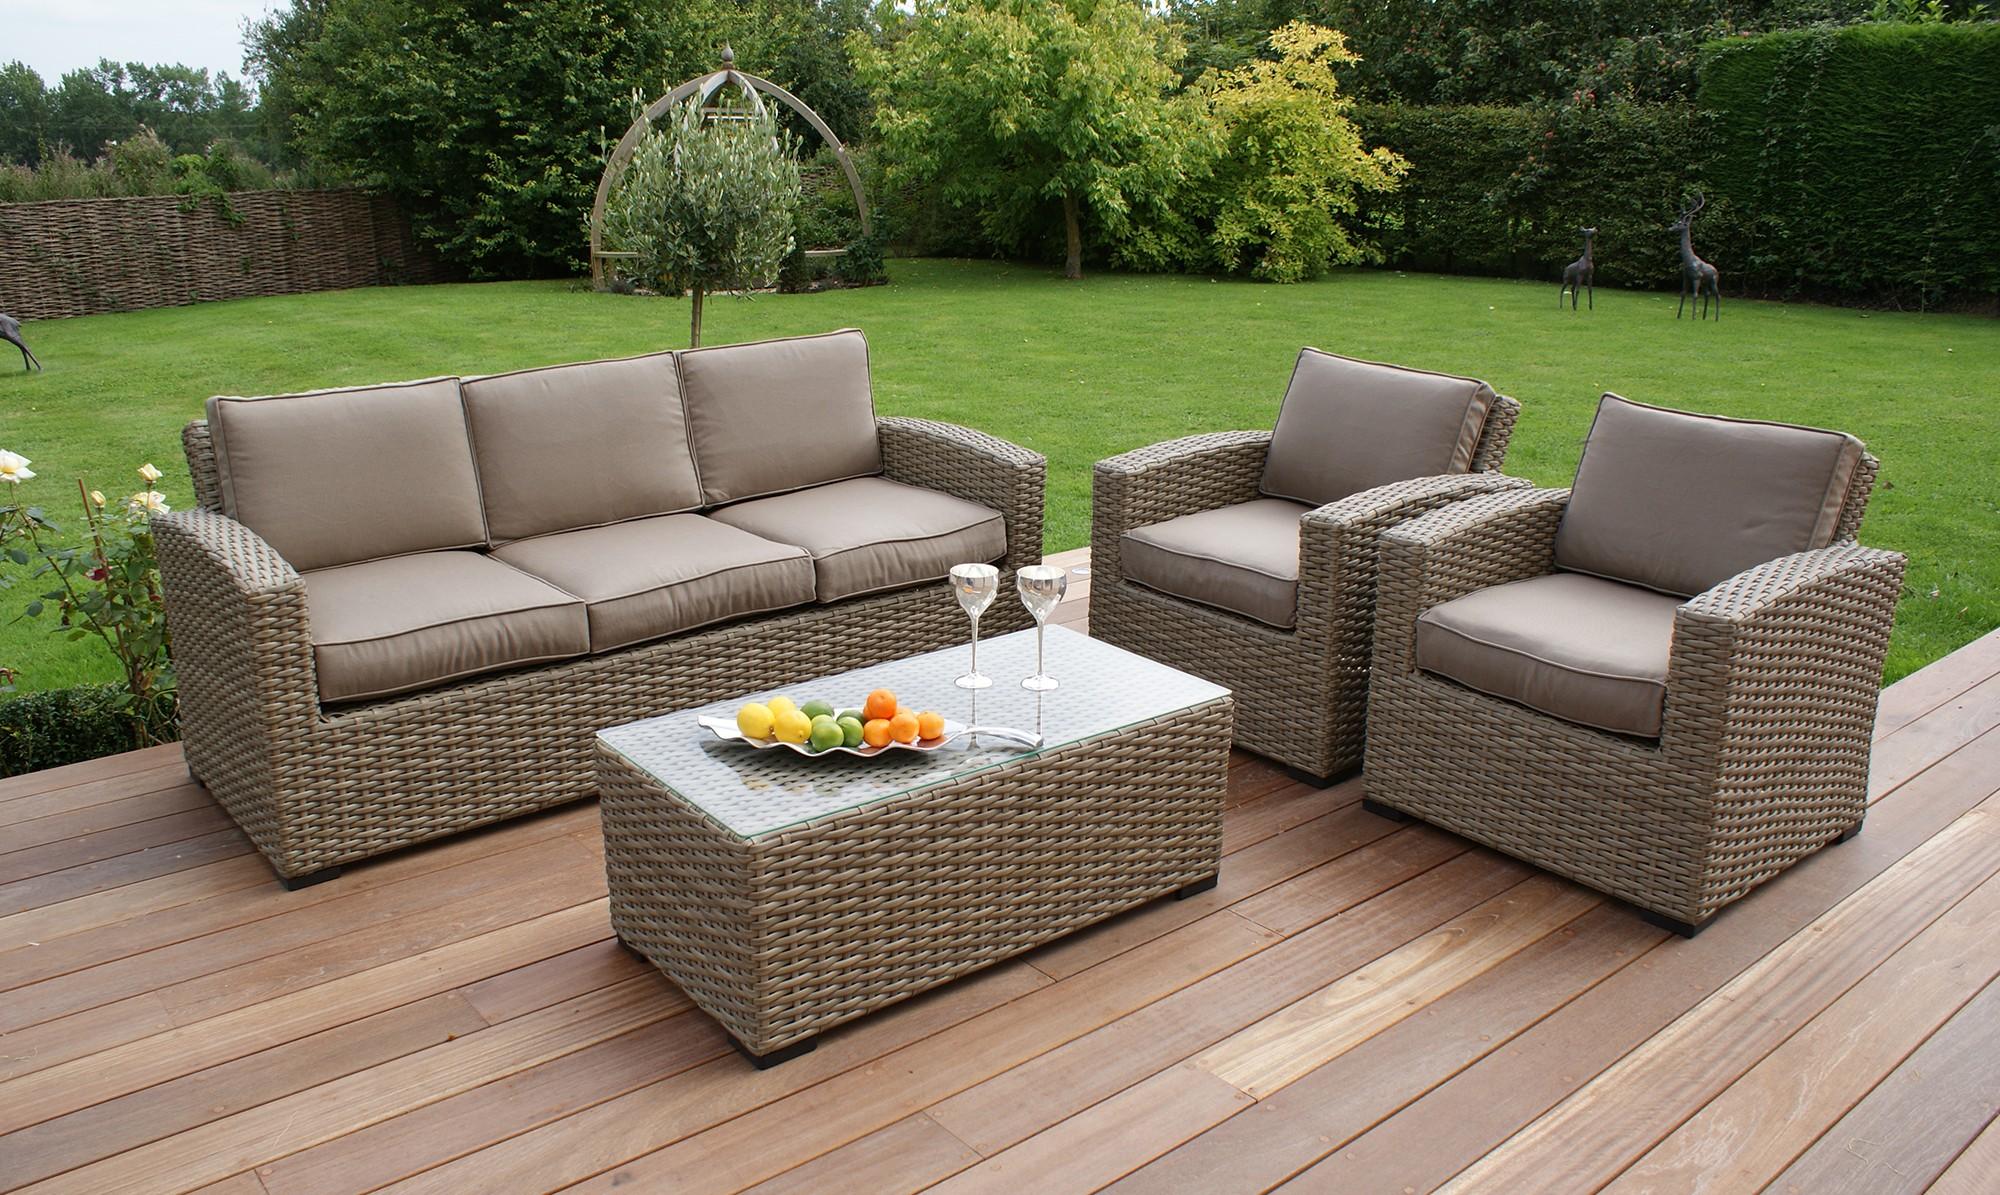 Amazing Antilles Natural 3 Seater Rattan Sofa Set - Fishpools rattan sofa set